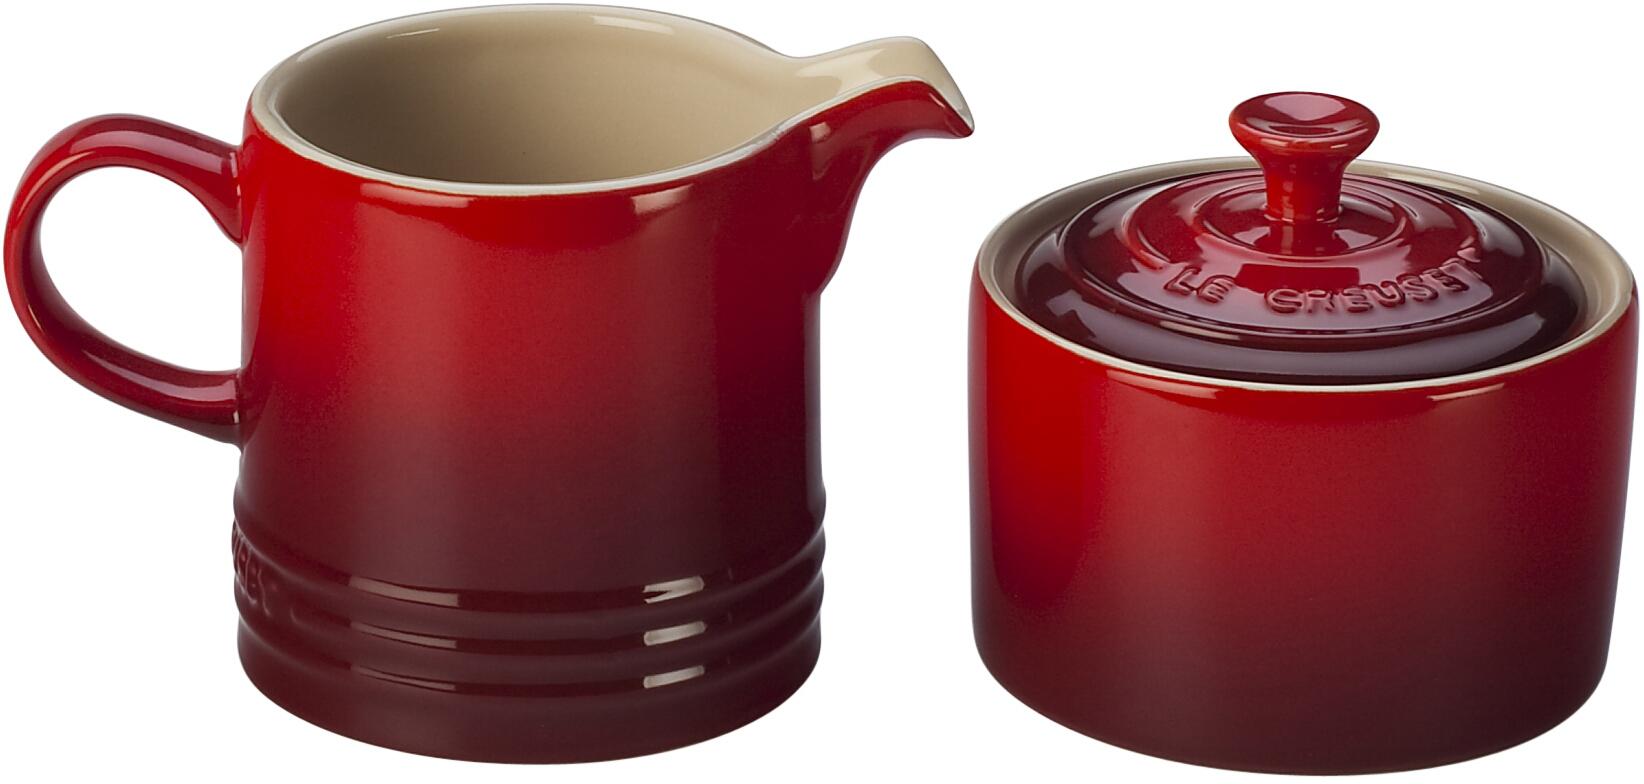 Le Creuset Cherry Stoneware Cream and Sugar Set